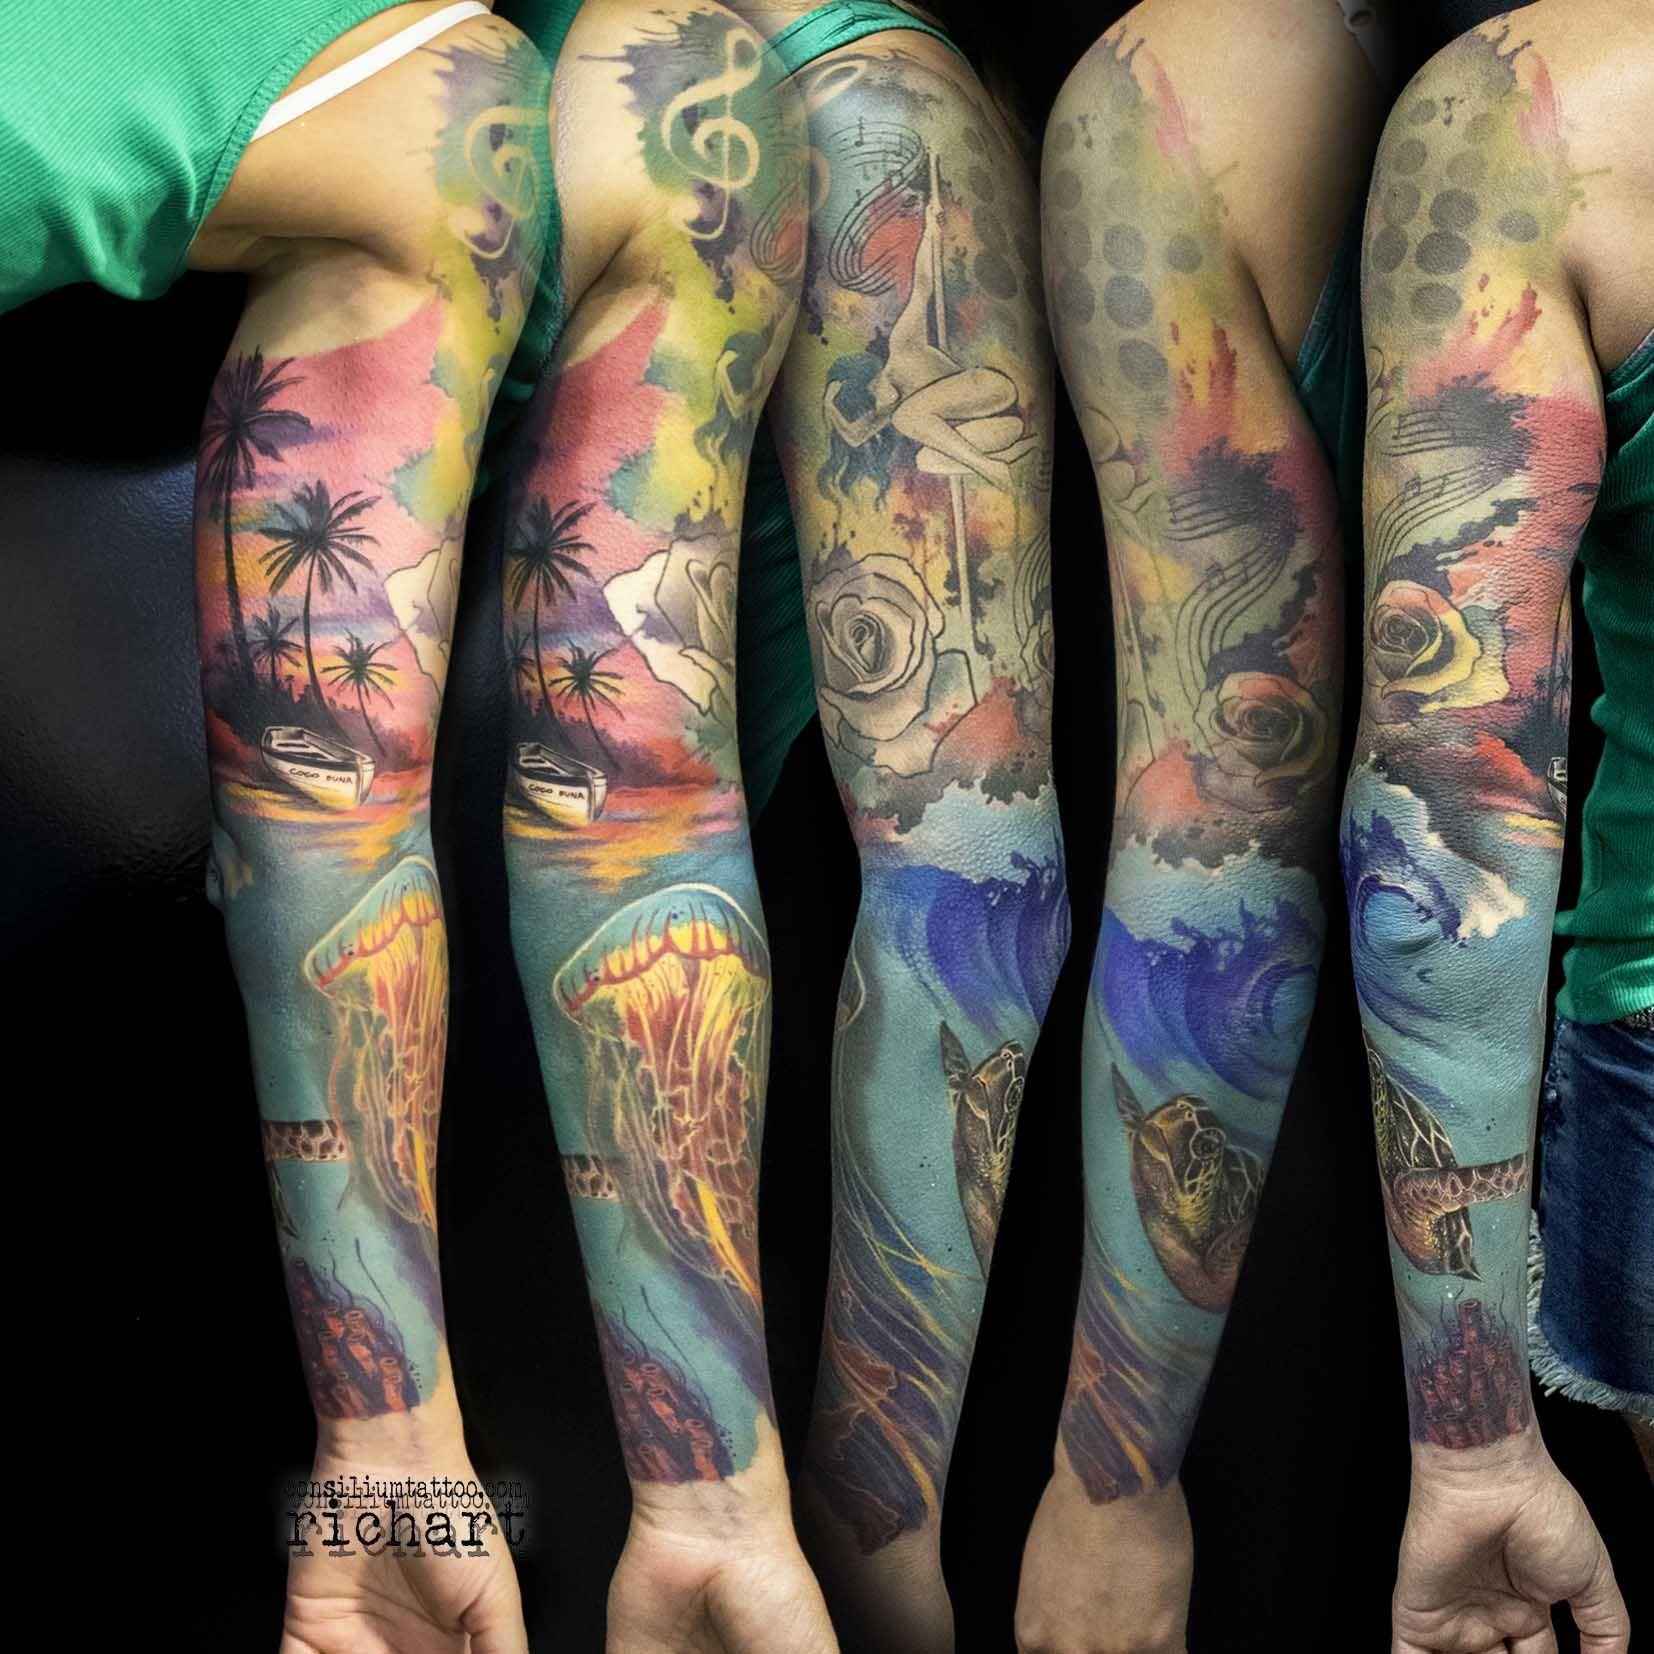 Tatuaje tattoo manga a color en consilium tattoo vilaseca - Mangas de tattoo ...